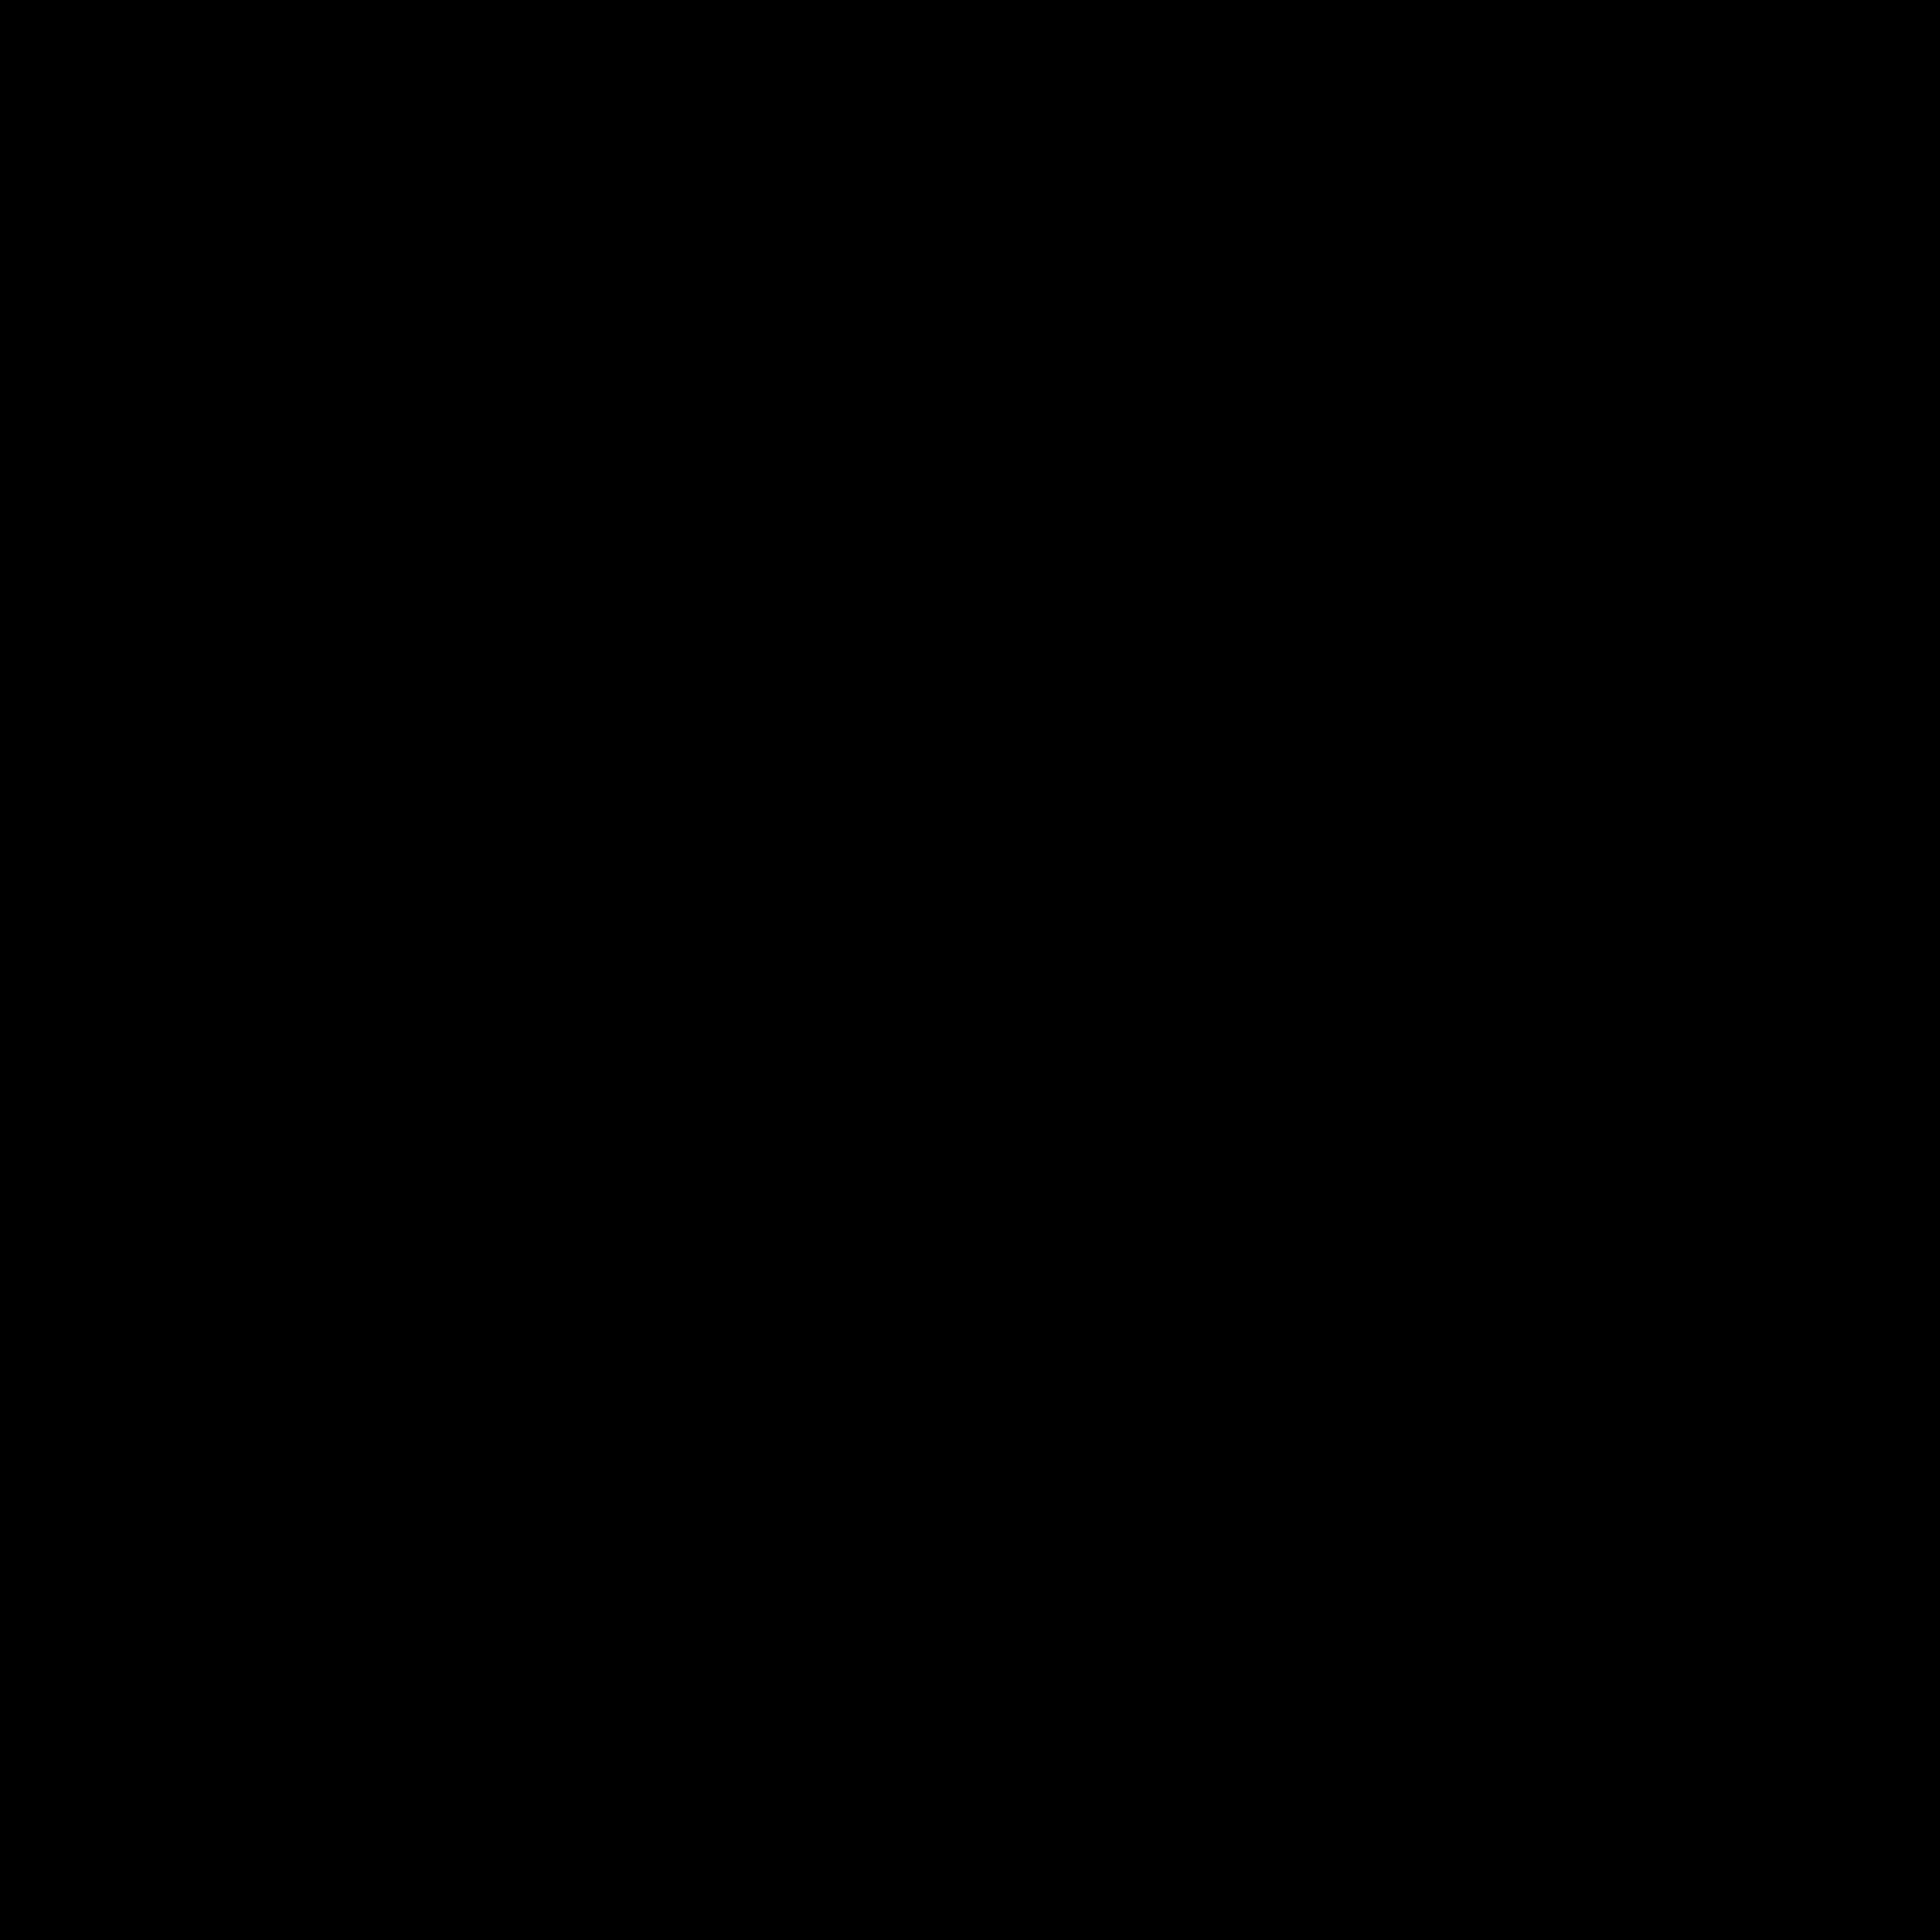 Helly Hansen Logo PNG Transparent & SVG Vector.